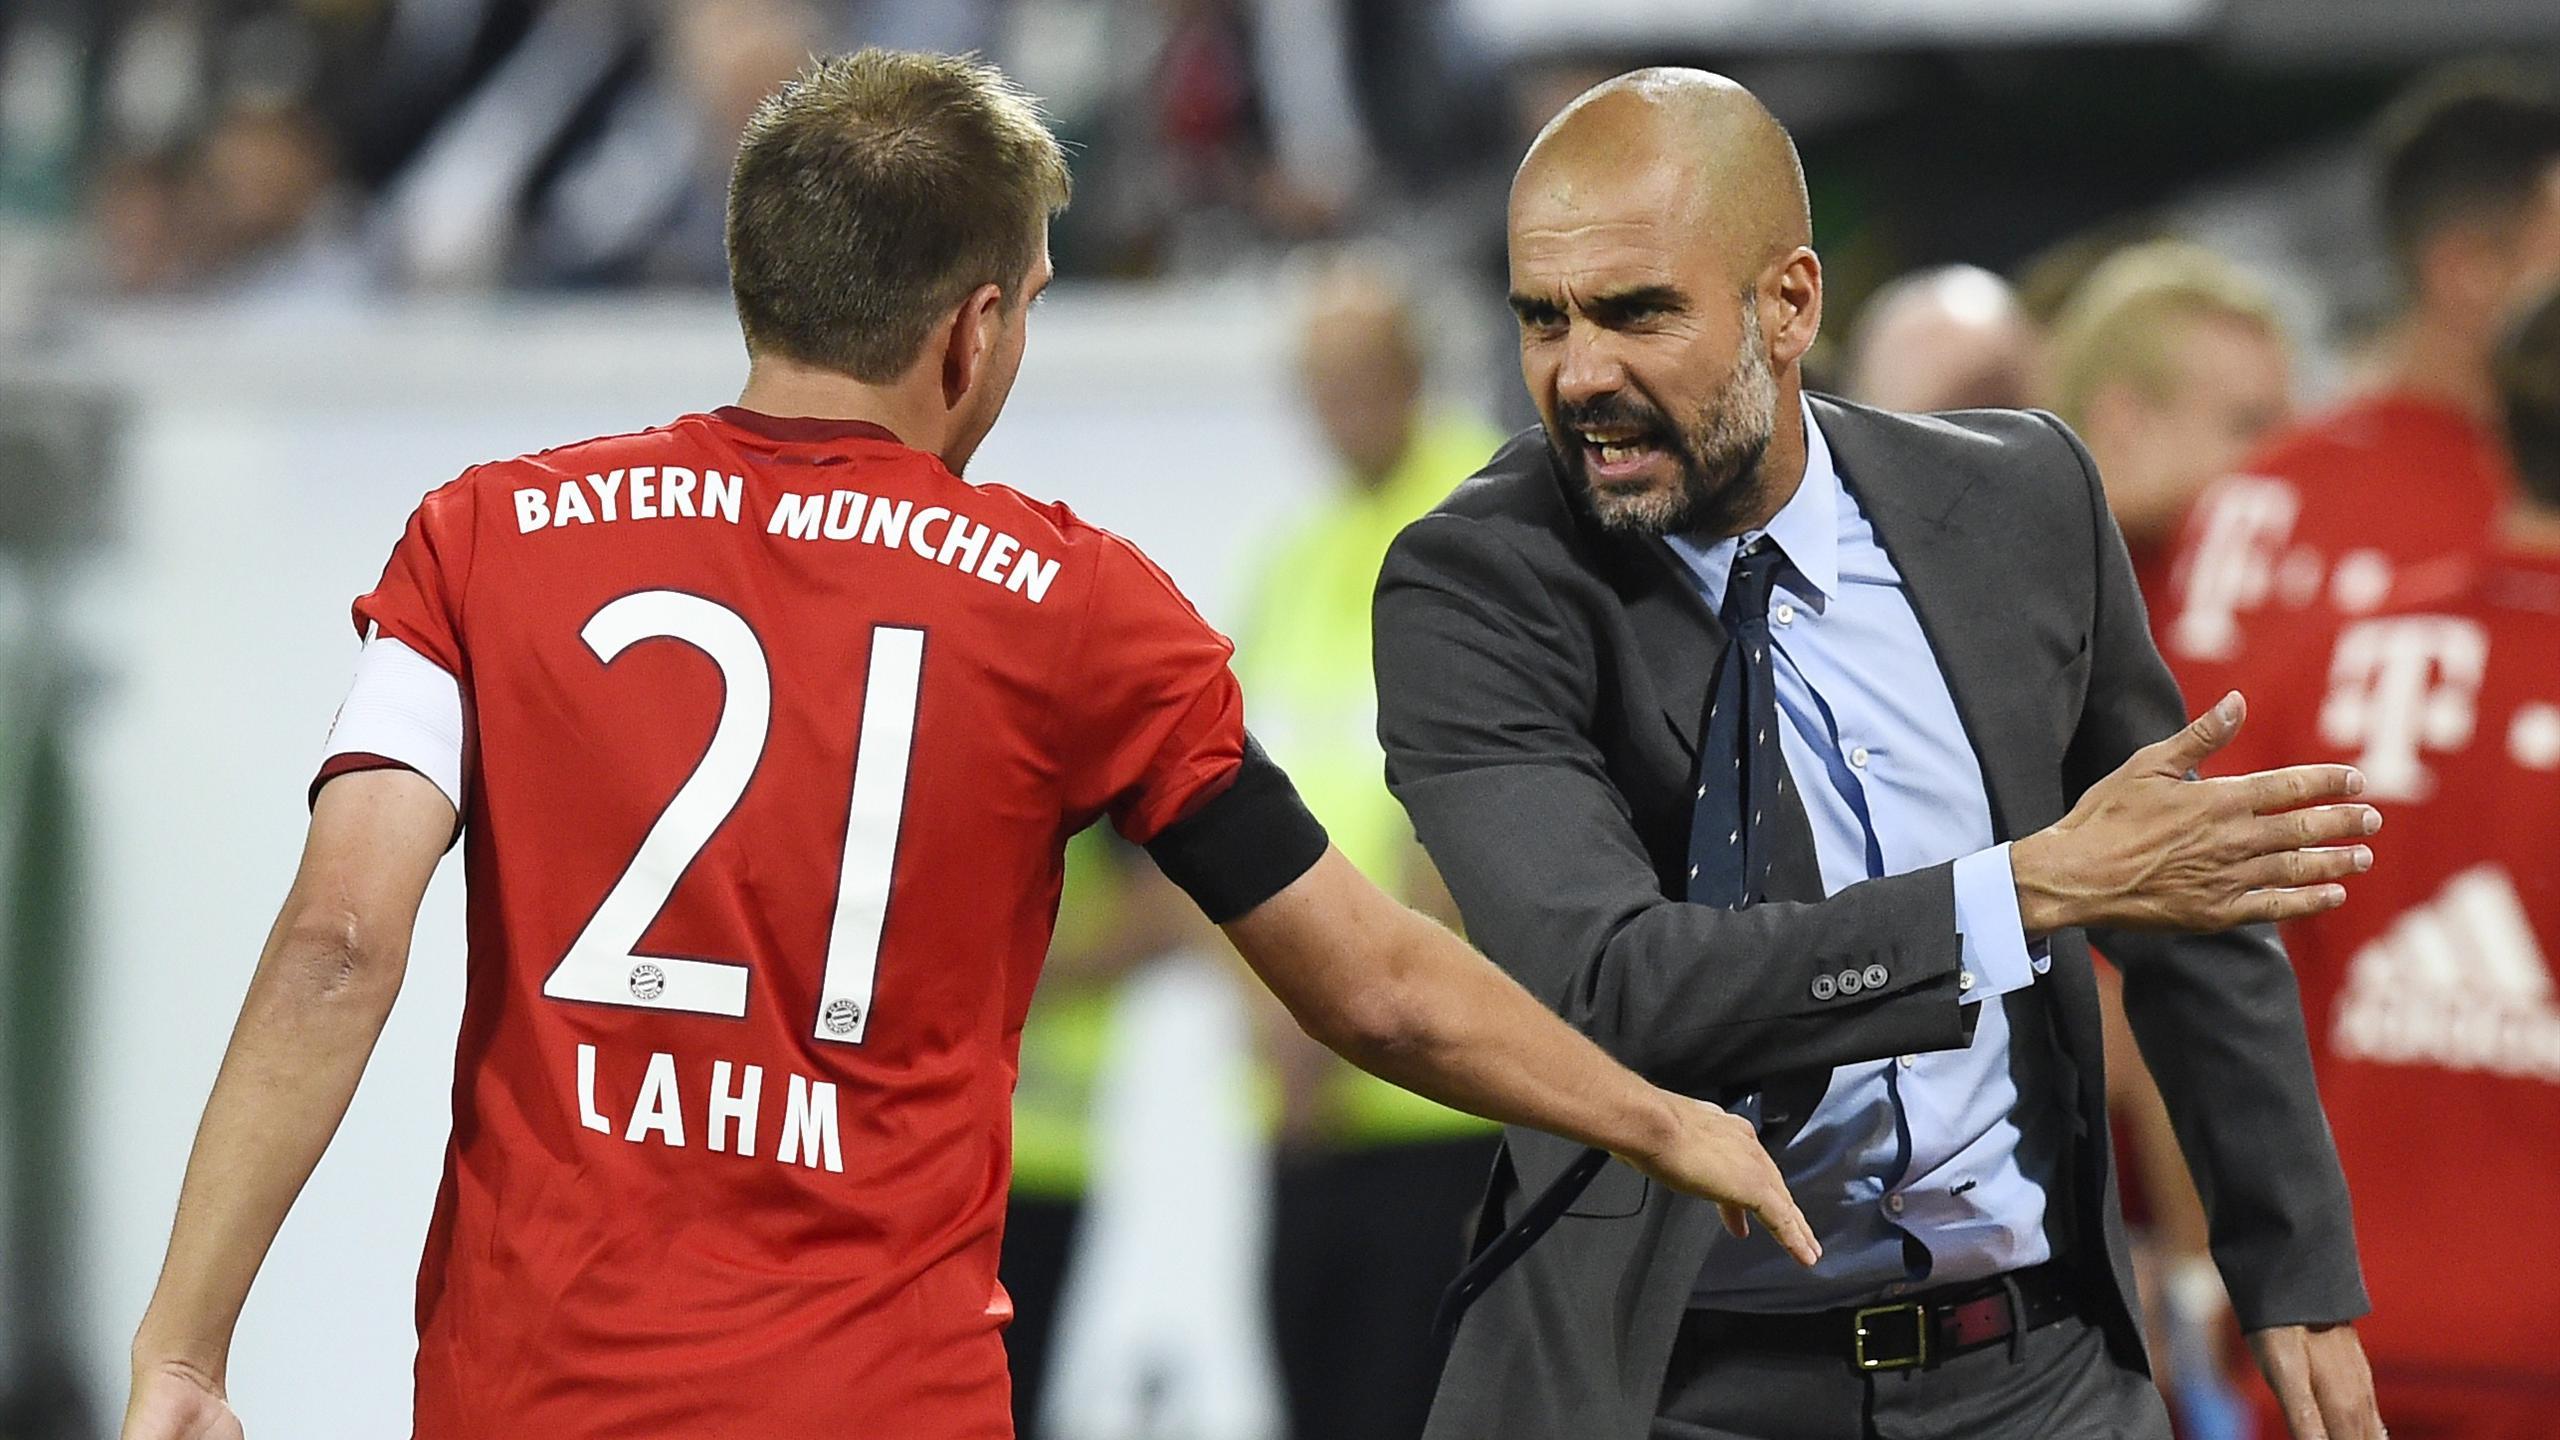 Philipp Lahm et Pep Guardiola (Bayern Munich)